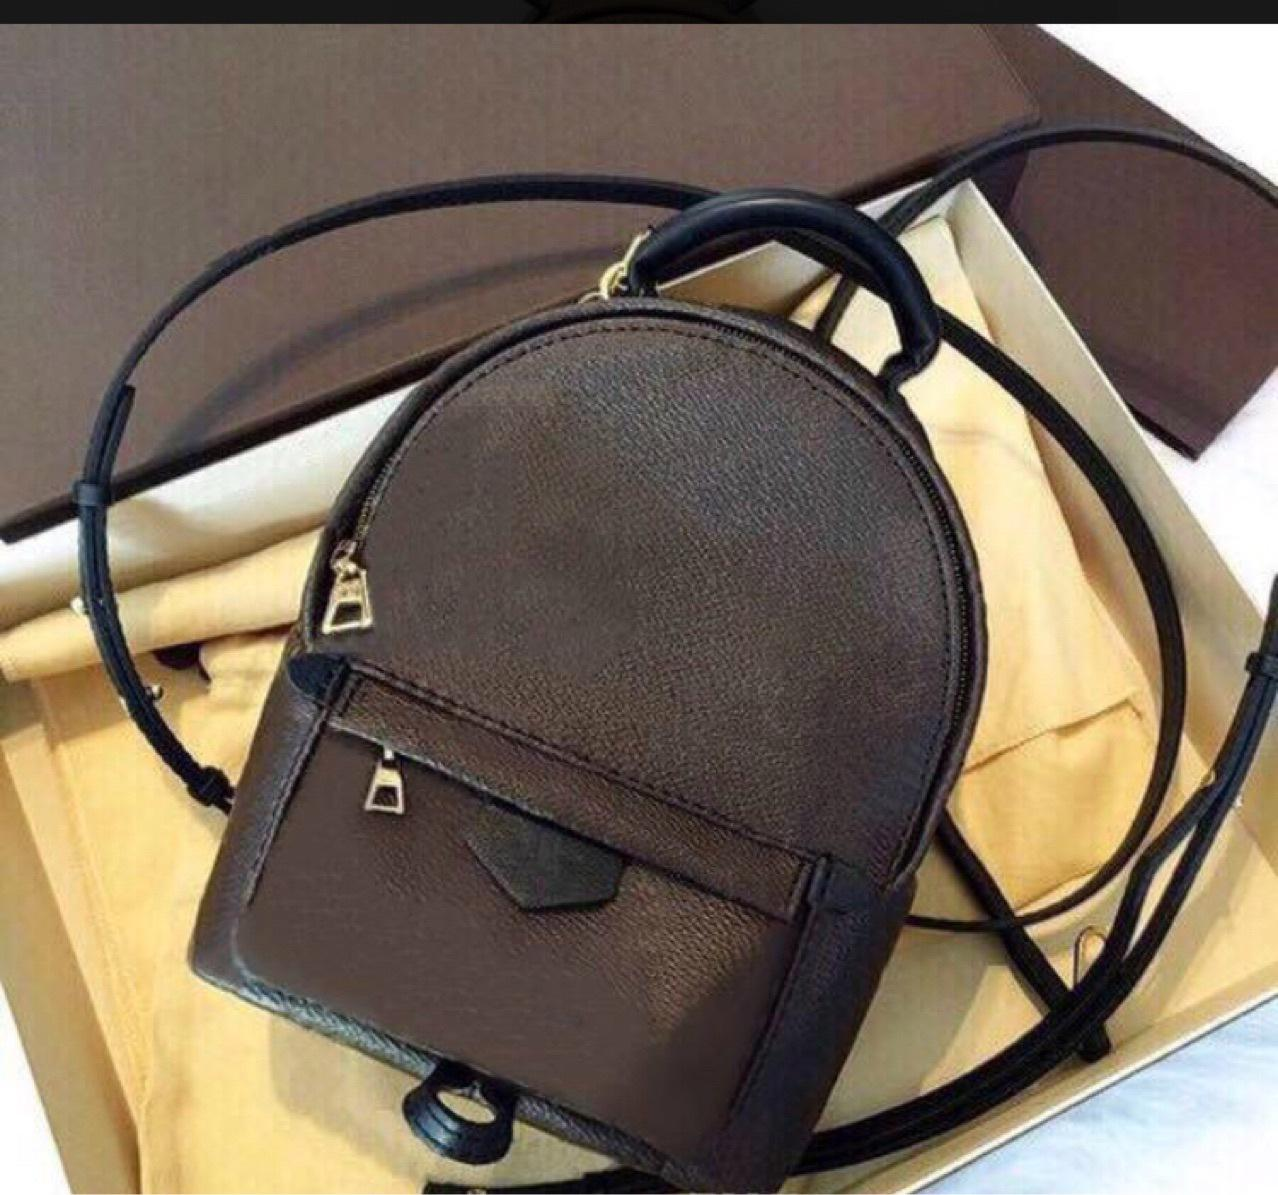 Designer di marca all'ingrosso Nuovi donne Palm Springs Mini Zaino Backpacks Bambini Zaini Donne Stampa PU Leather Mini School Bags 11p2